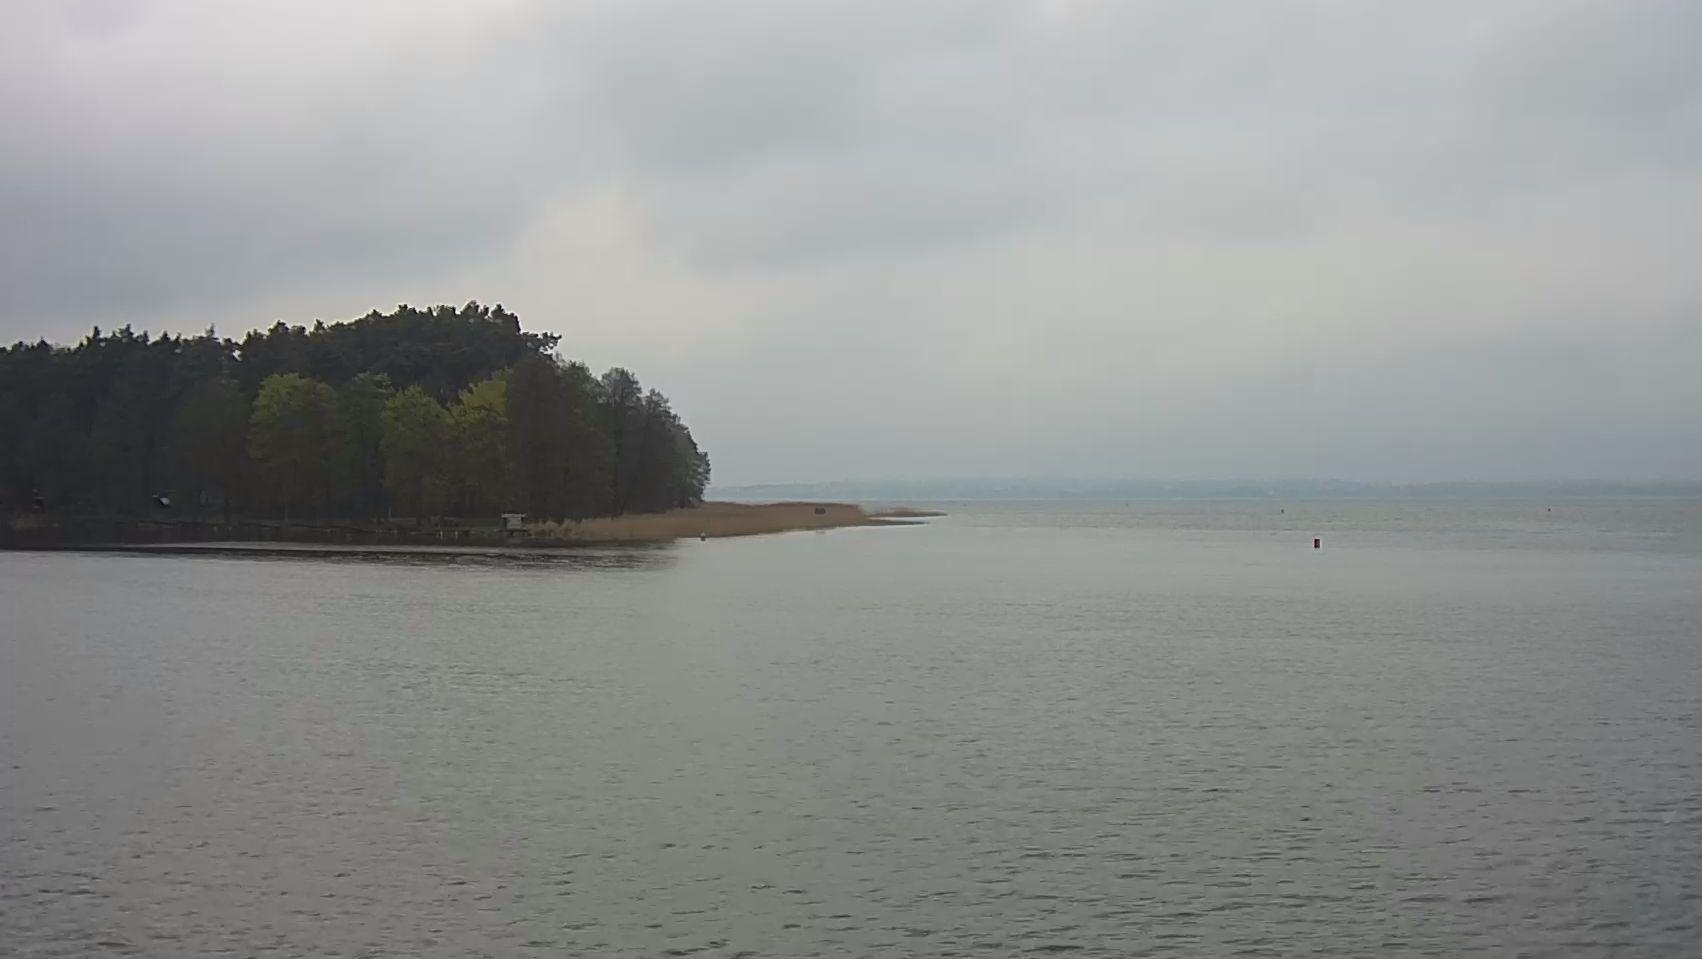 Jezioro Niegocin, marina Lester Club